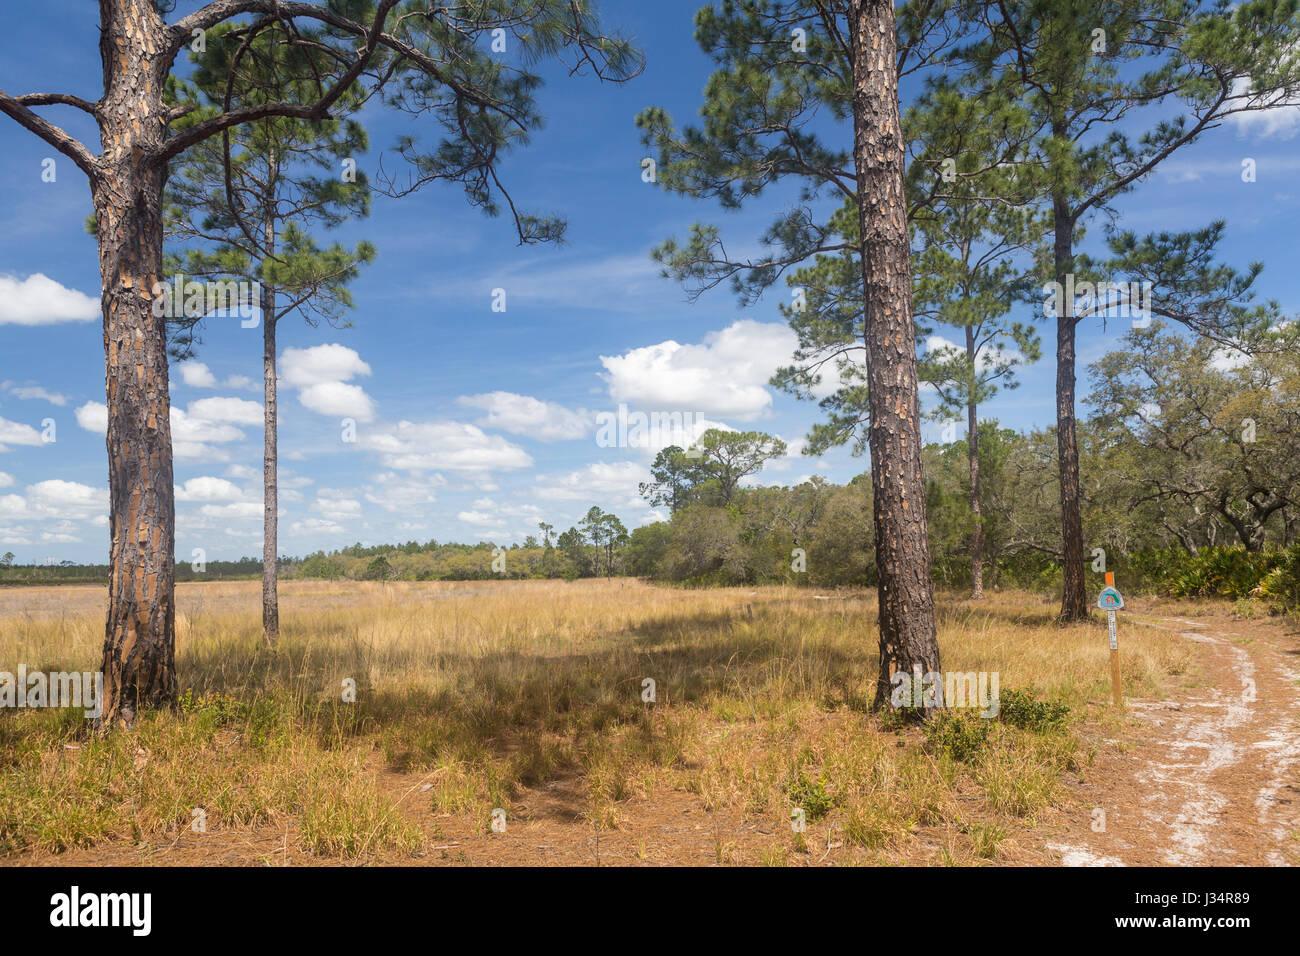 The Florida Trail, a National Scenic Trail, winding through the sand pine scrub and oak hammock habitats of Hopkins - Stock Image